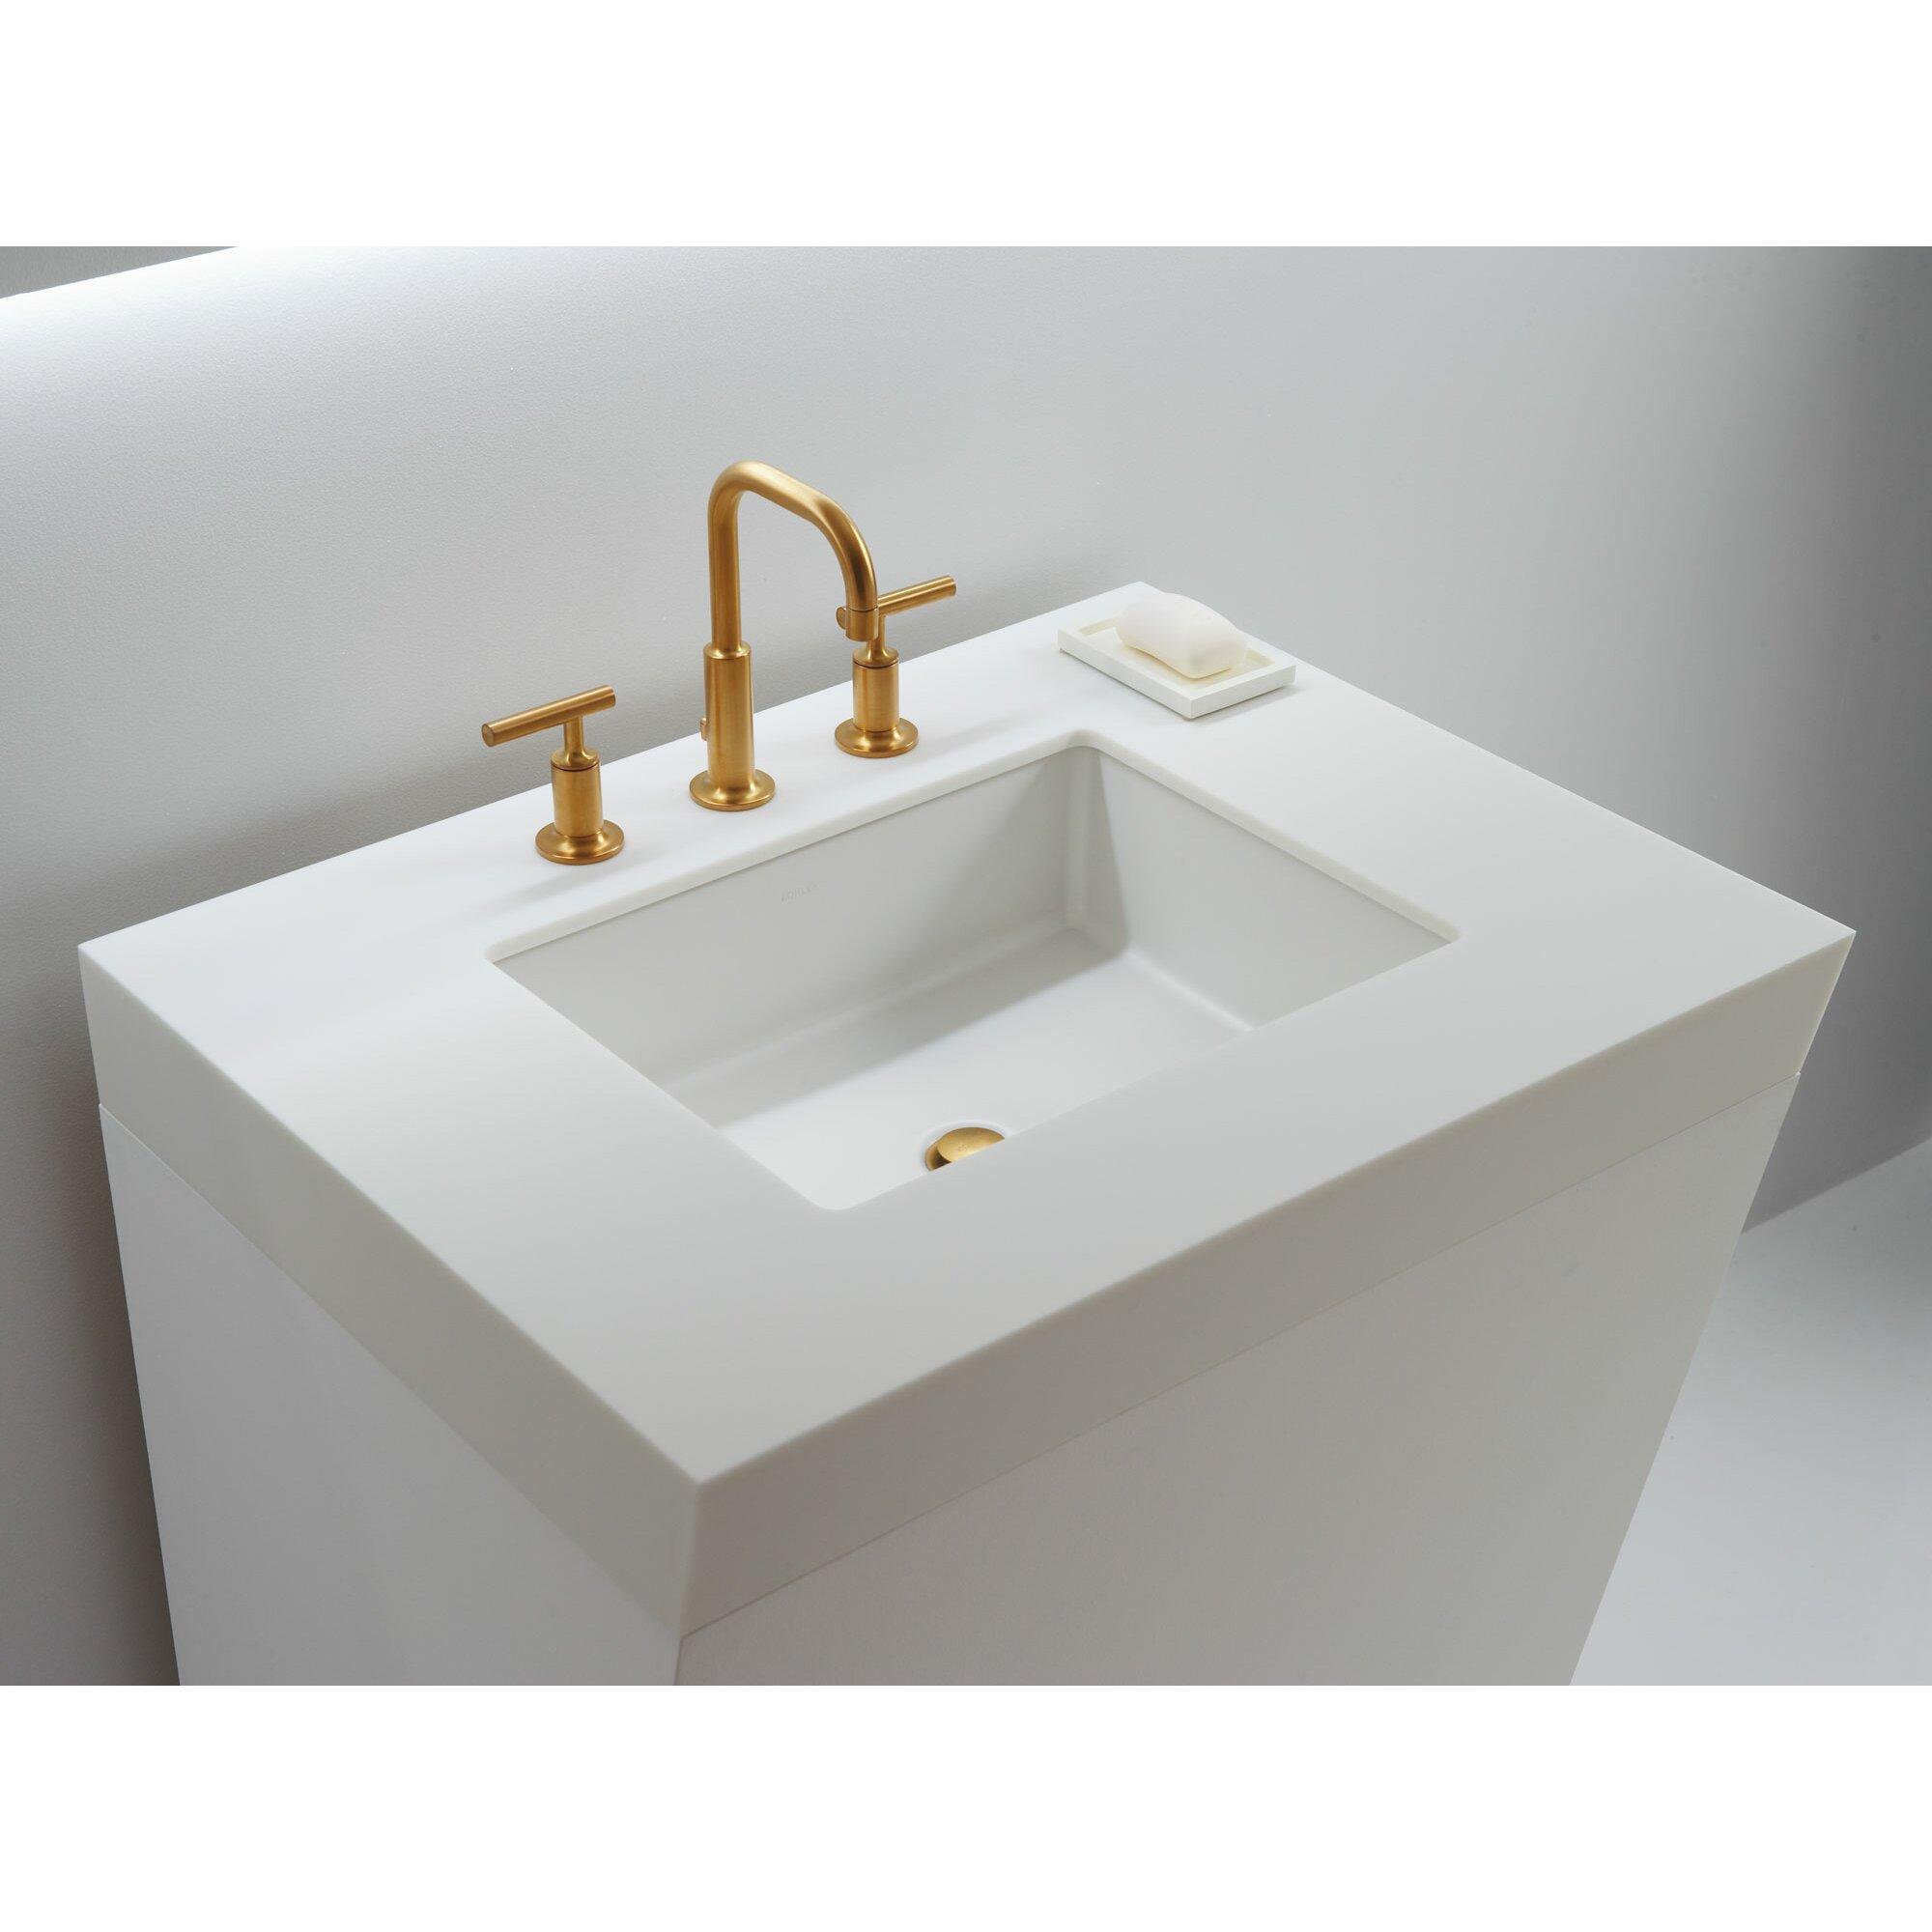 madison dropindetails oval americh bathtubs thumbs bathtub undermount